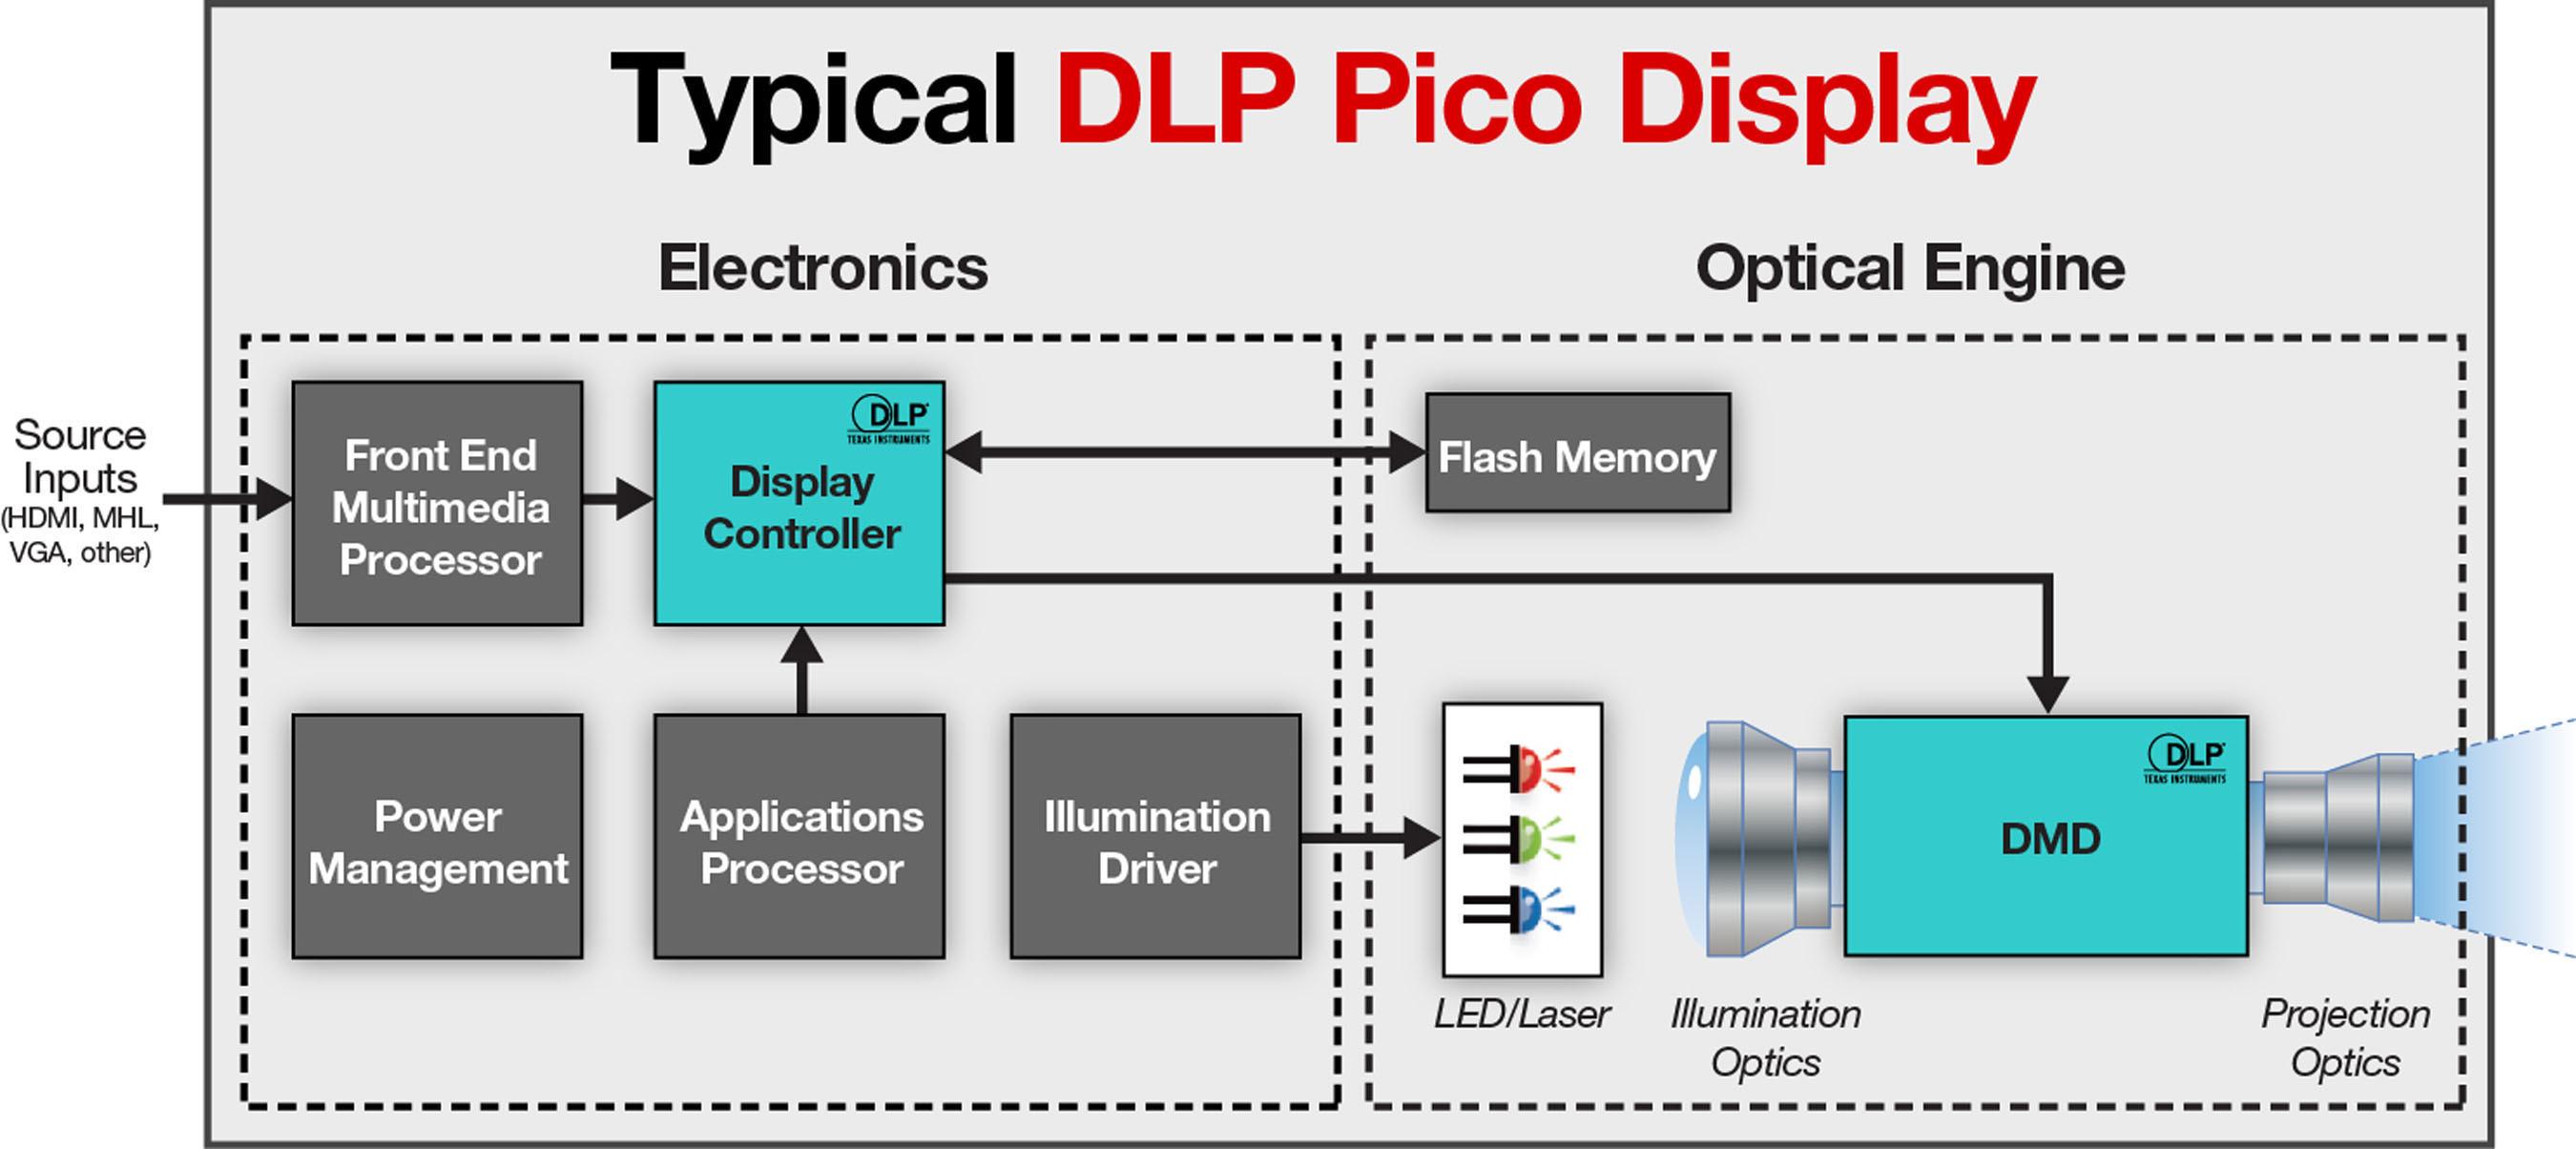 System Block Diagram For A Typical Texas Instruments DLP Pico(TM)-powered Display. (PRNewsFoto/Texas ...